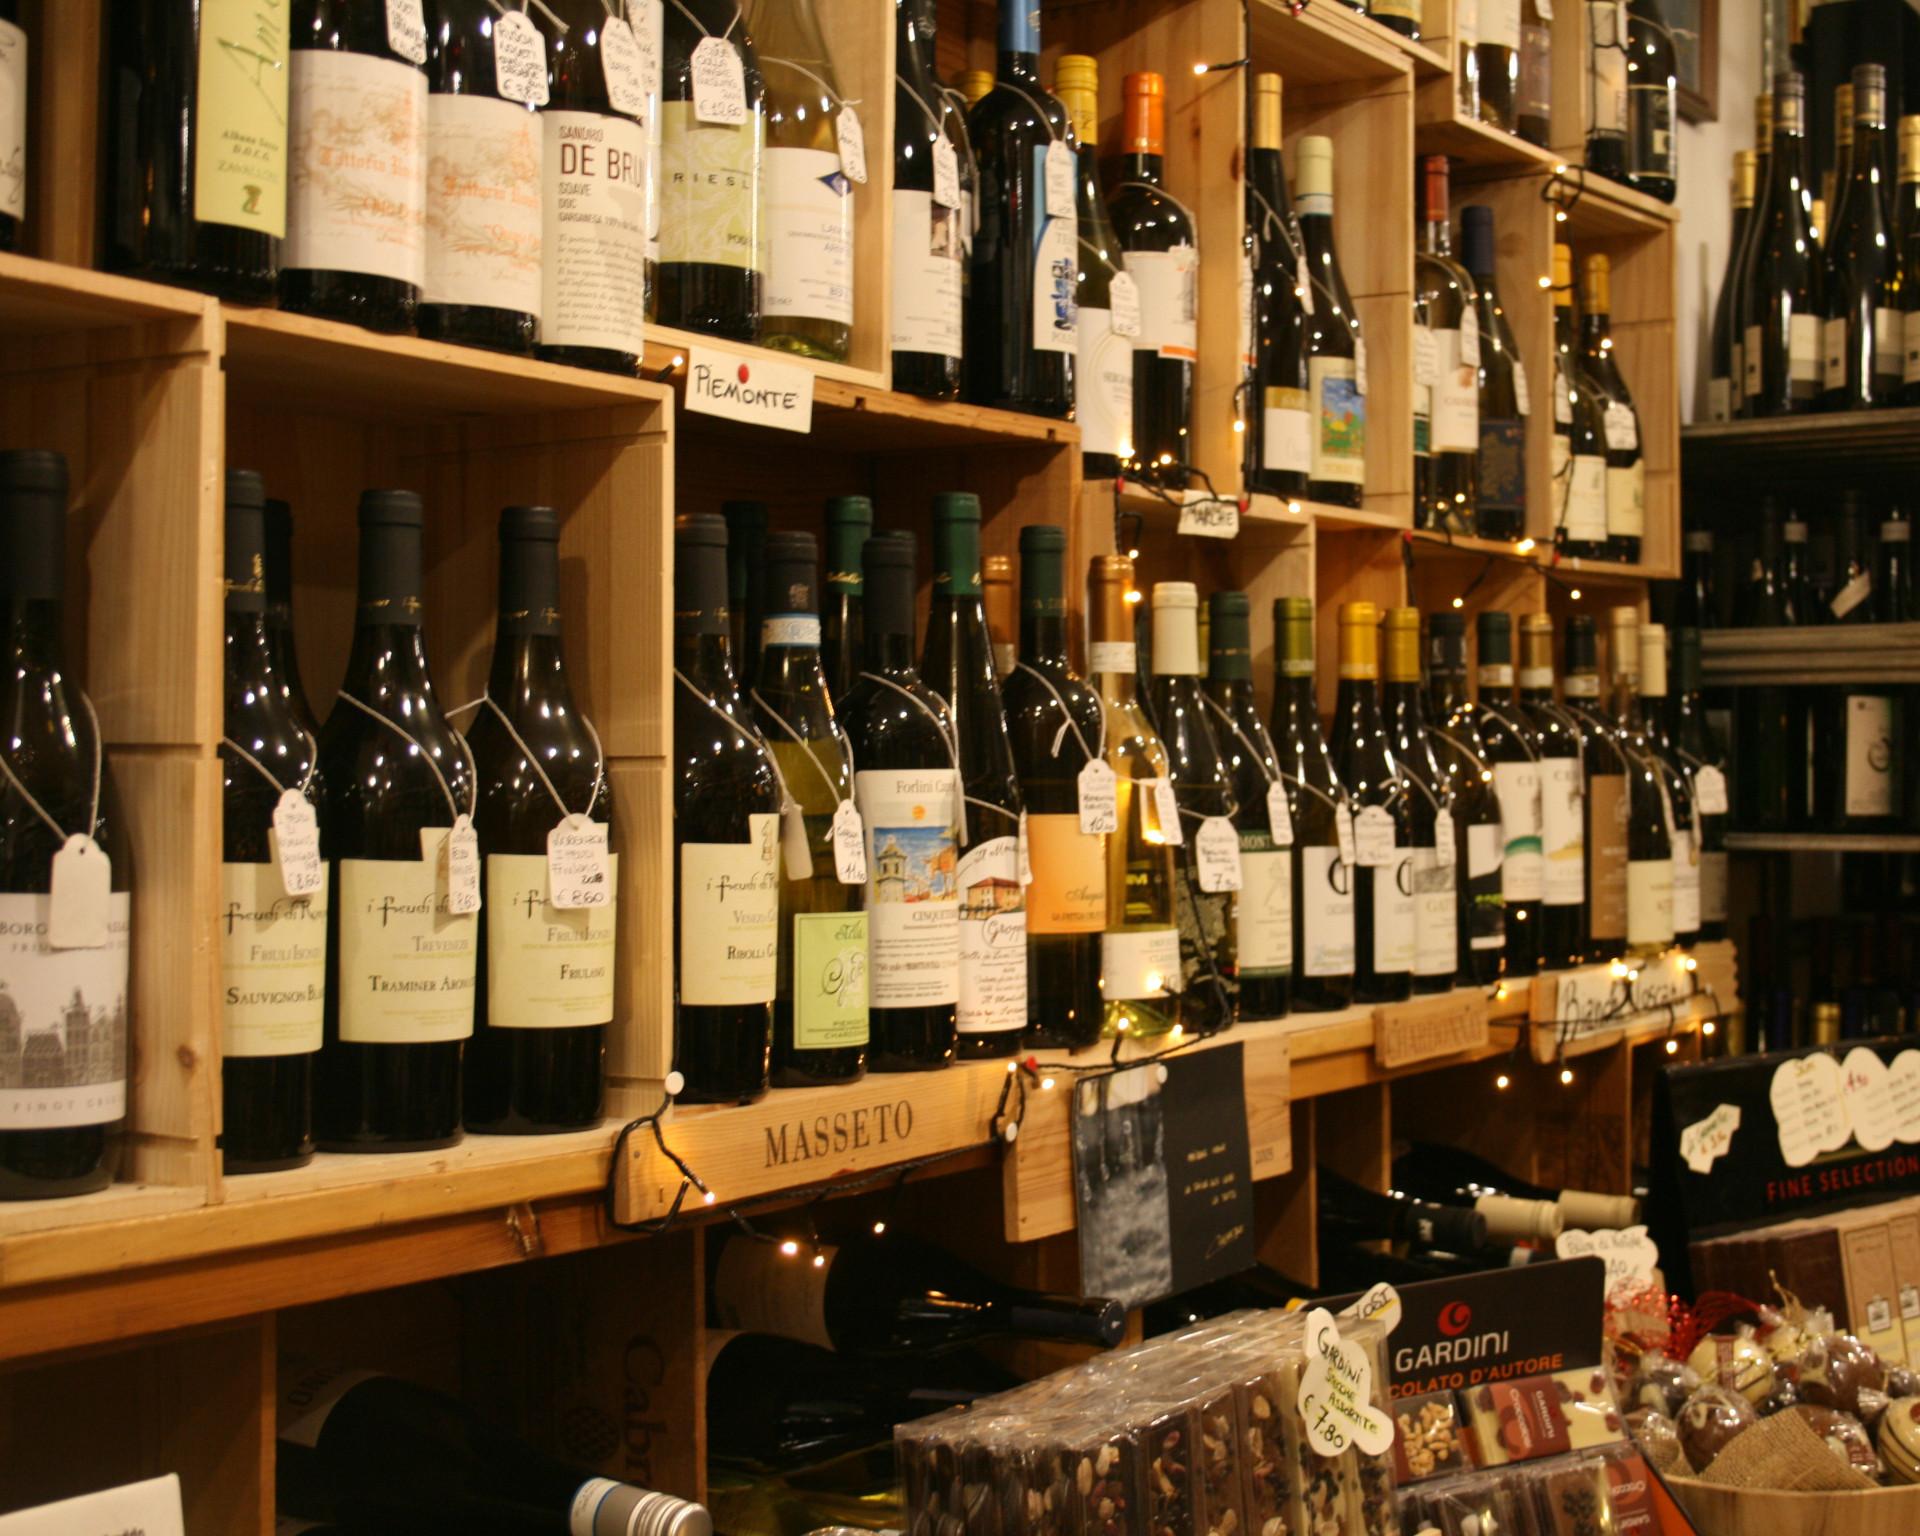 Enoteca Sergio Viareggio scaffale vini